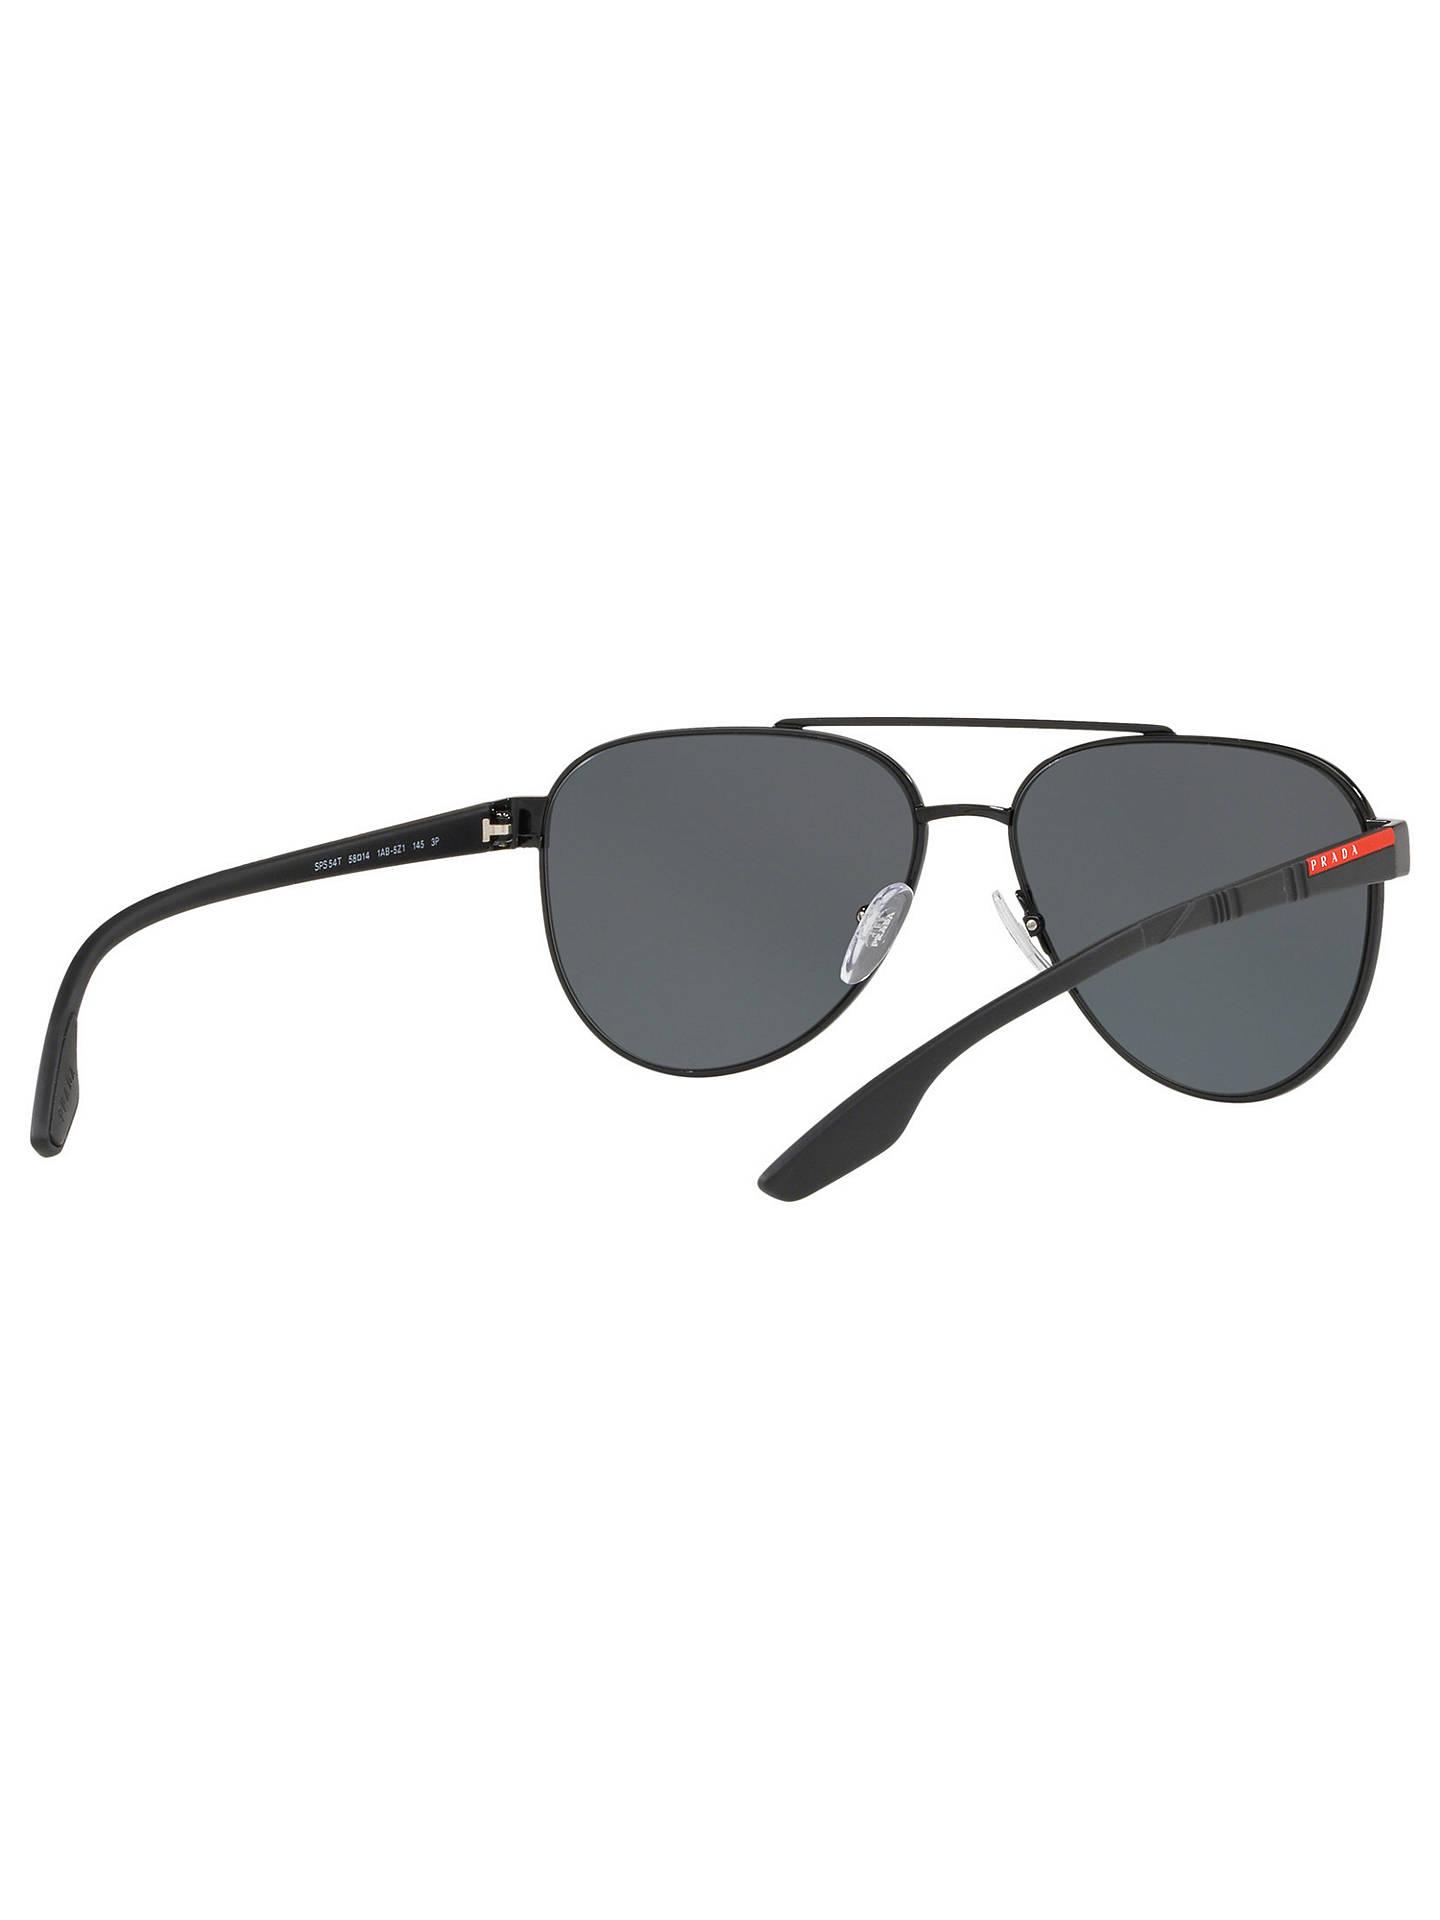 c425aaf6e12 Prada Linea Rossa PS 54TS Men s Polarised Aviator Sunglasses at John ...